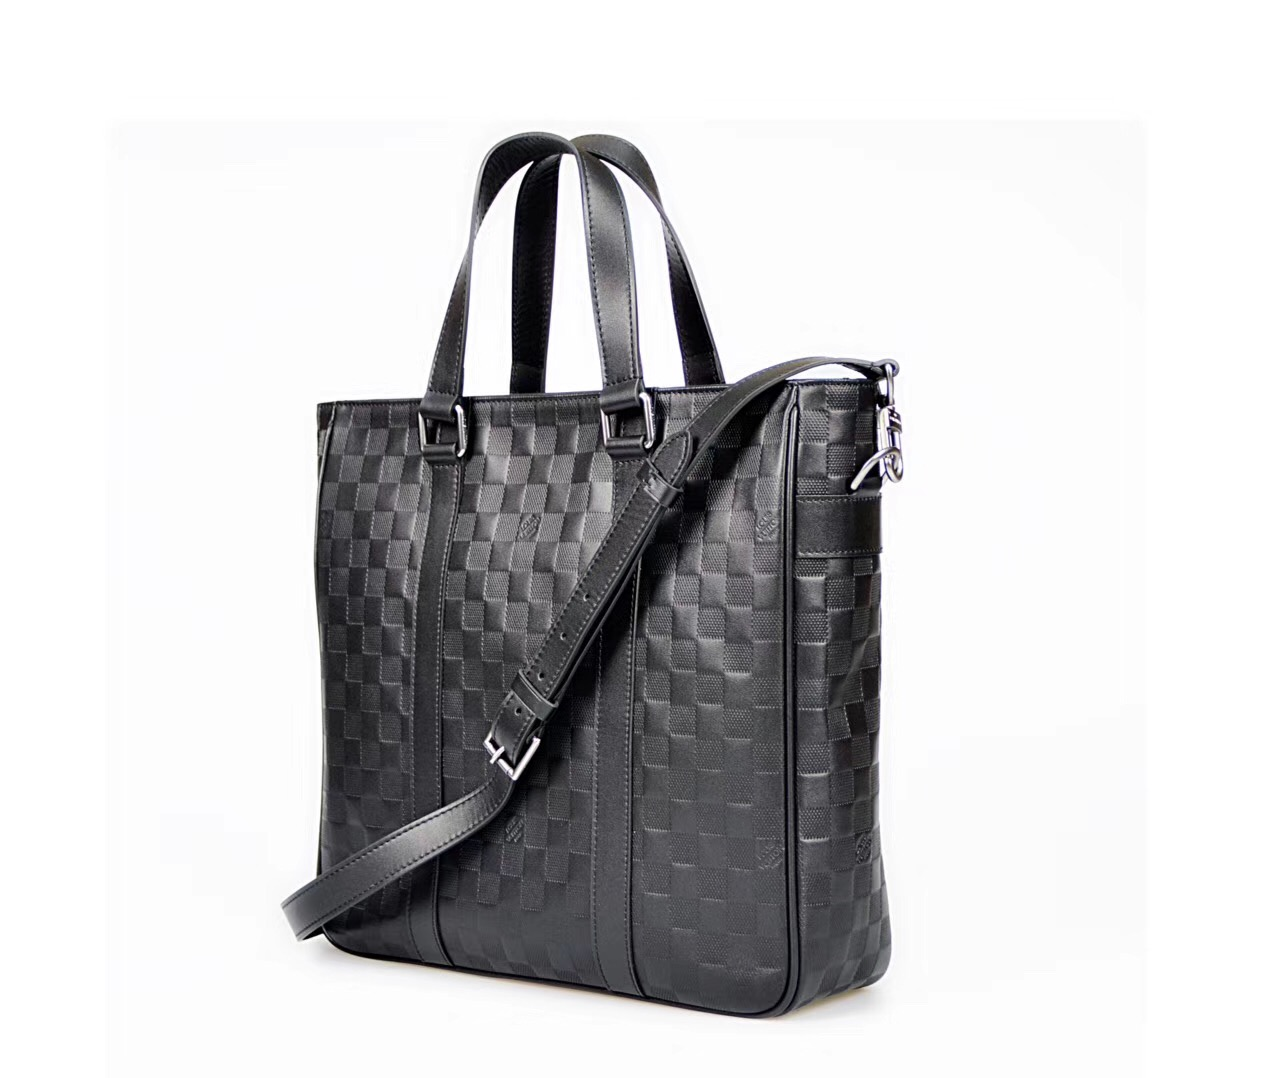 99c2ba53dc48 ... Men LV Louis Vuitton Damier Tote Leather Handbags N41269 bags Black ...